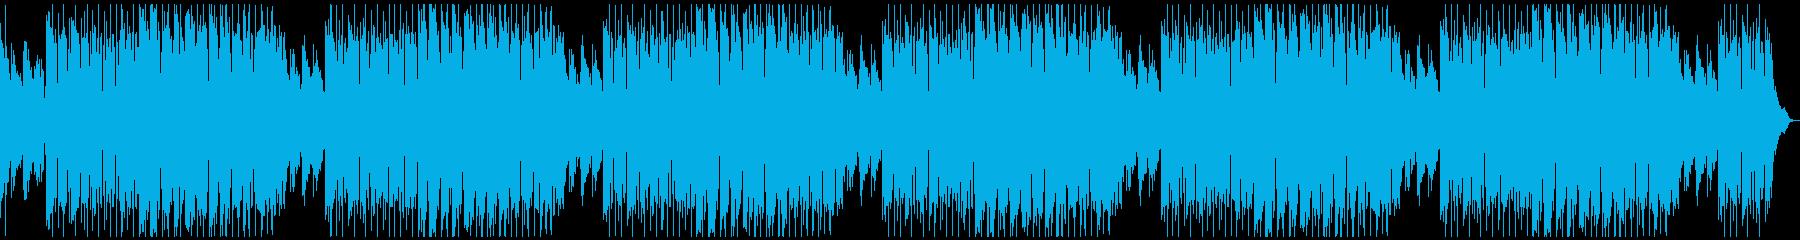 Development, development, technology, ambi, 10 minutes's reproduced waveform